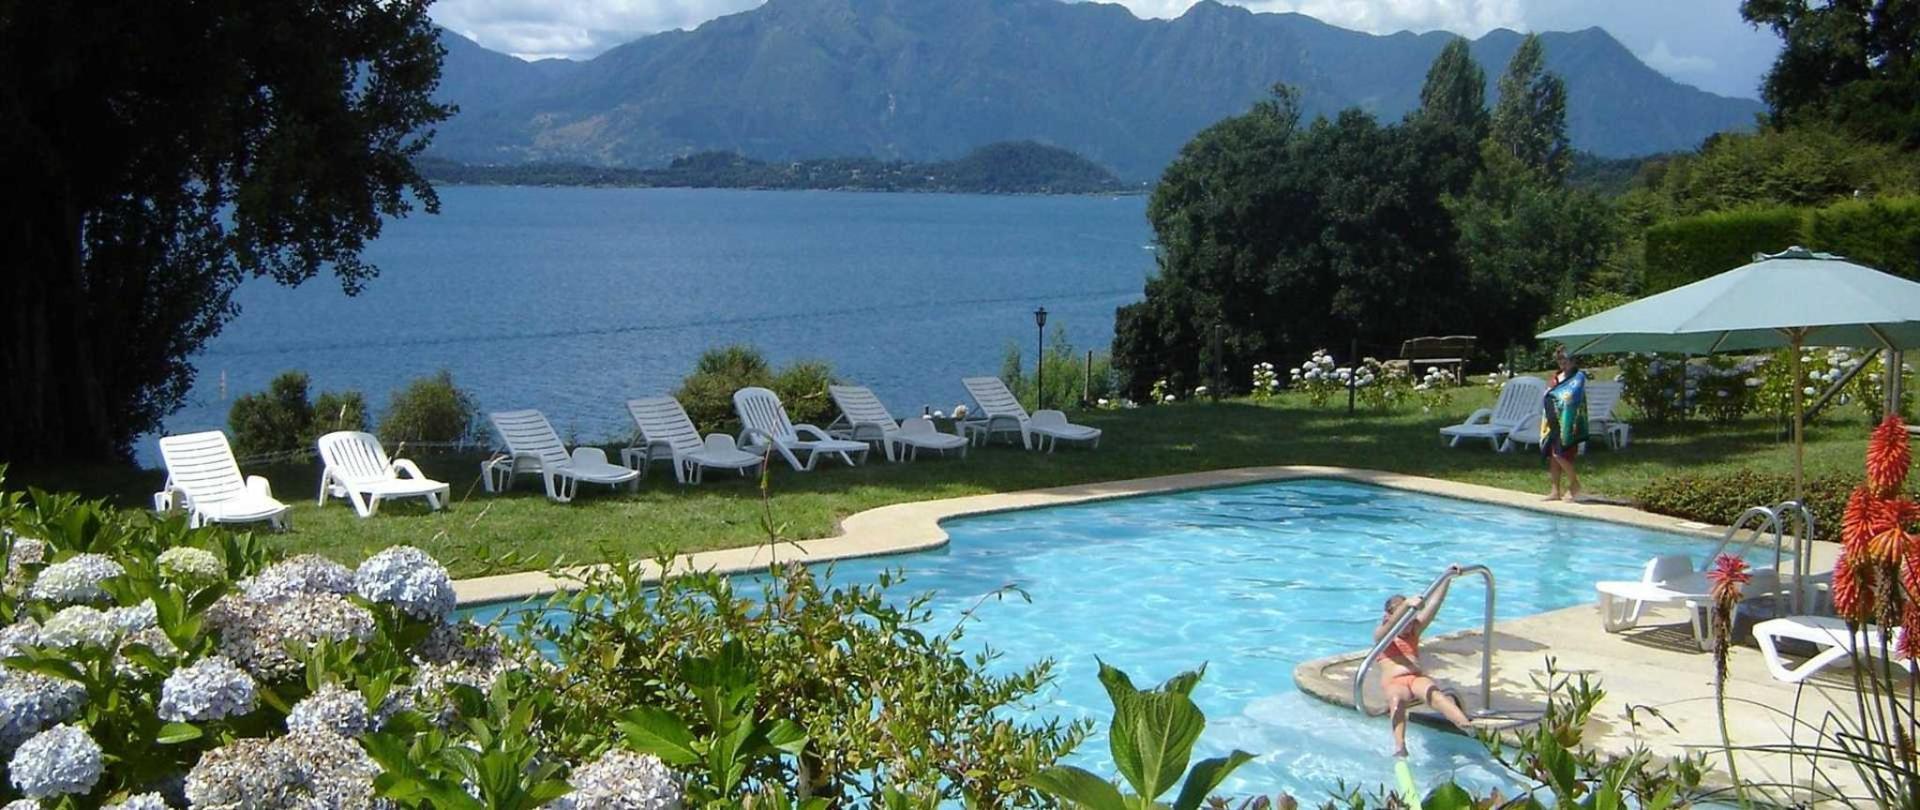 homepage-cabanas-monte-verde-chile2.jpeg